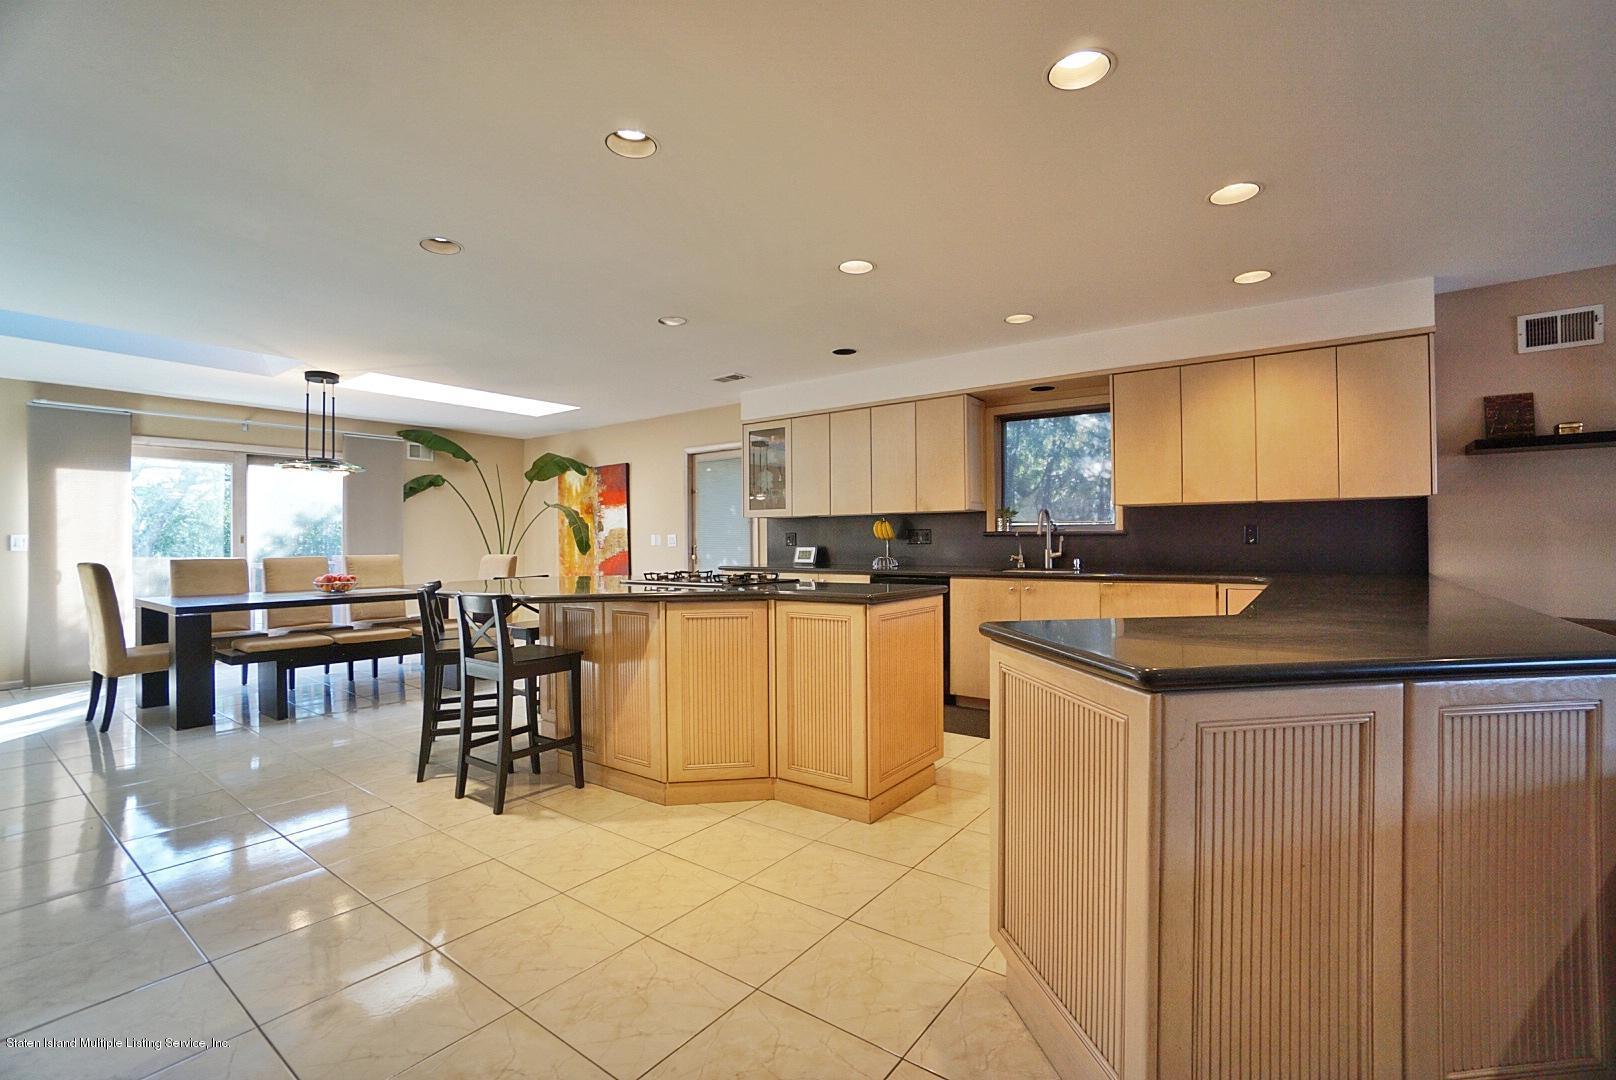 Single Family - Detached 183 Kensington Avenue  Staten Island, NY 10305, MLS-1127107-11